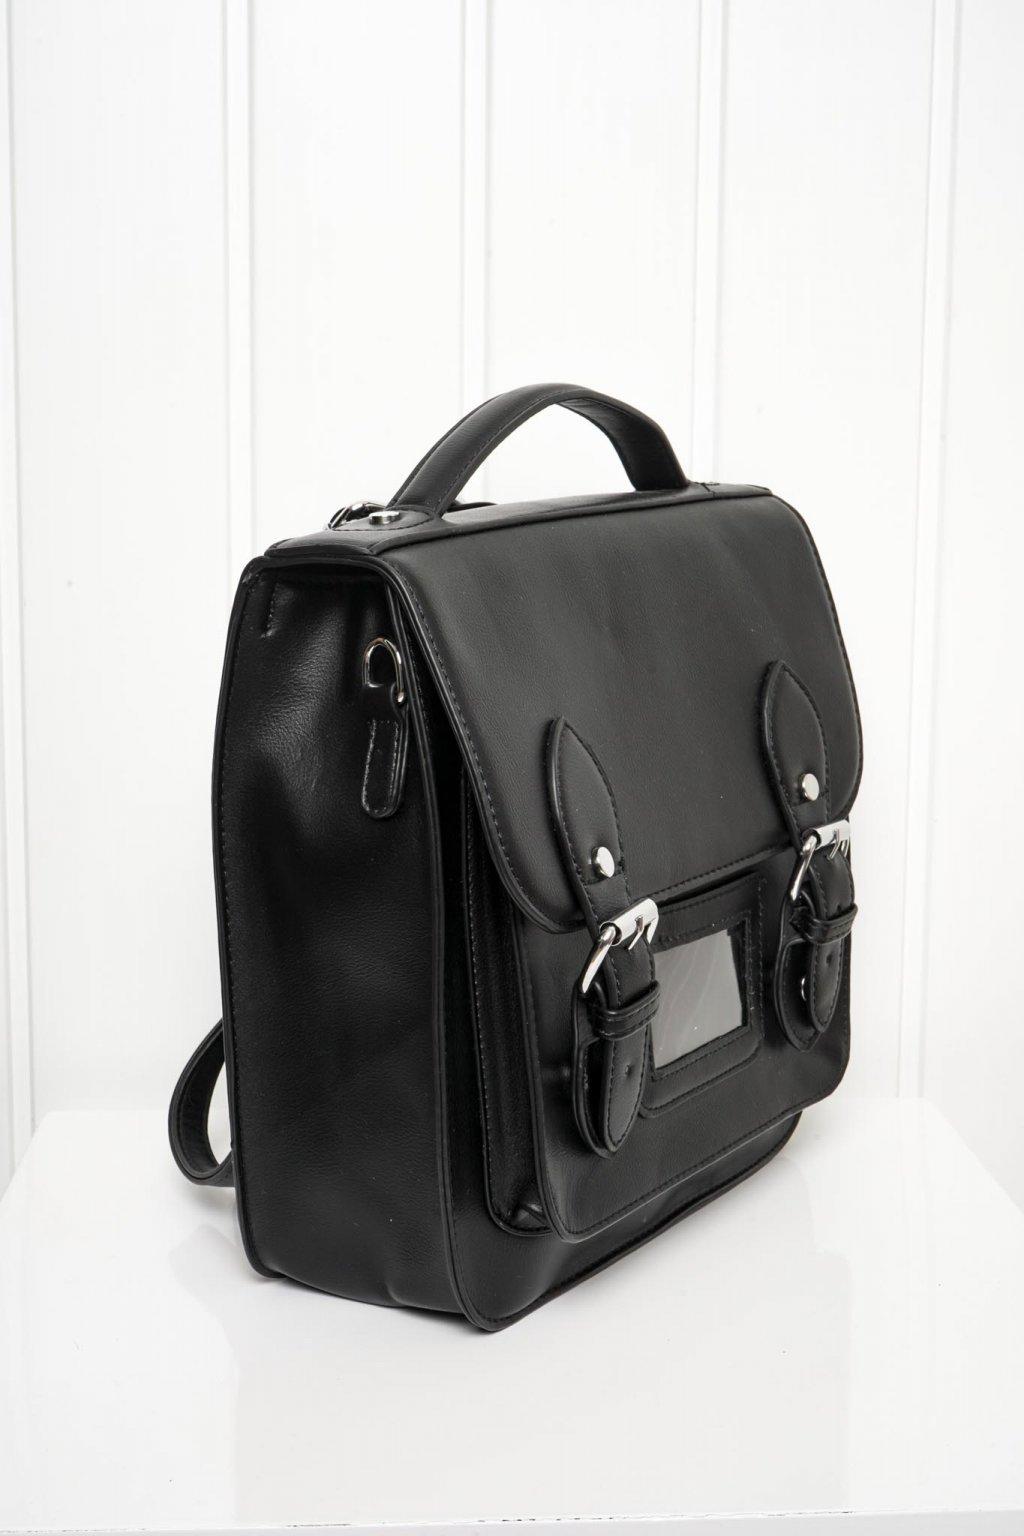 Kabelka, crossbody, ruksak, shopping bag, shopperka, 423